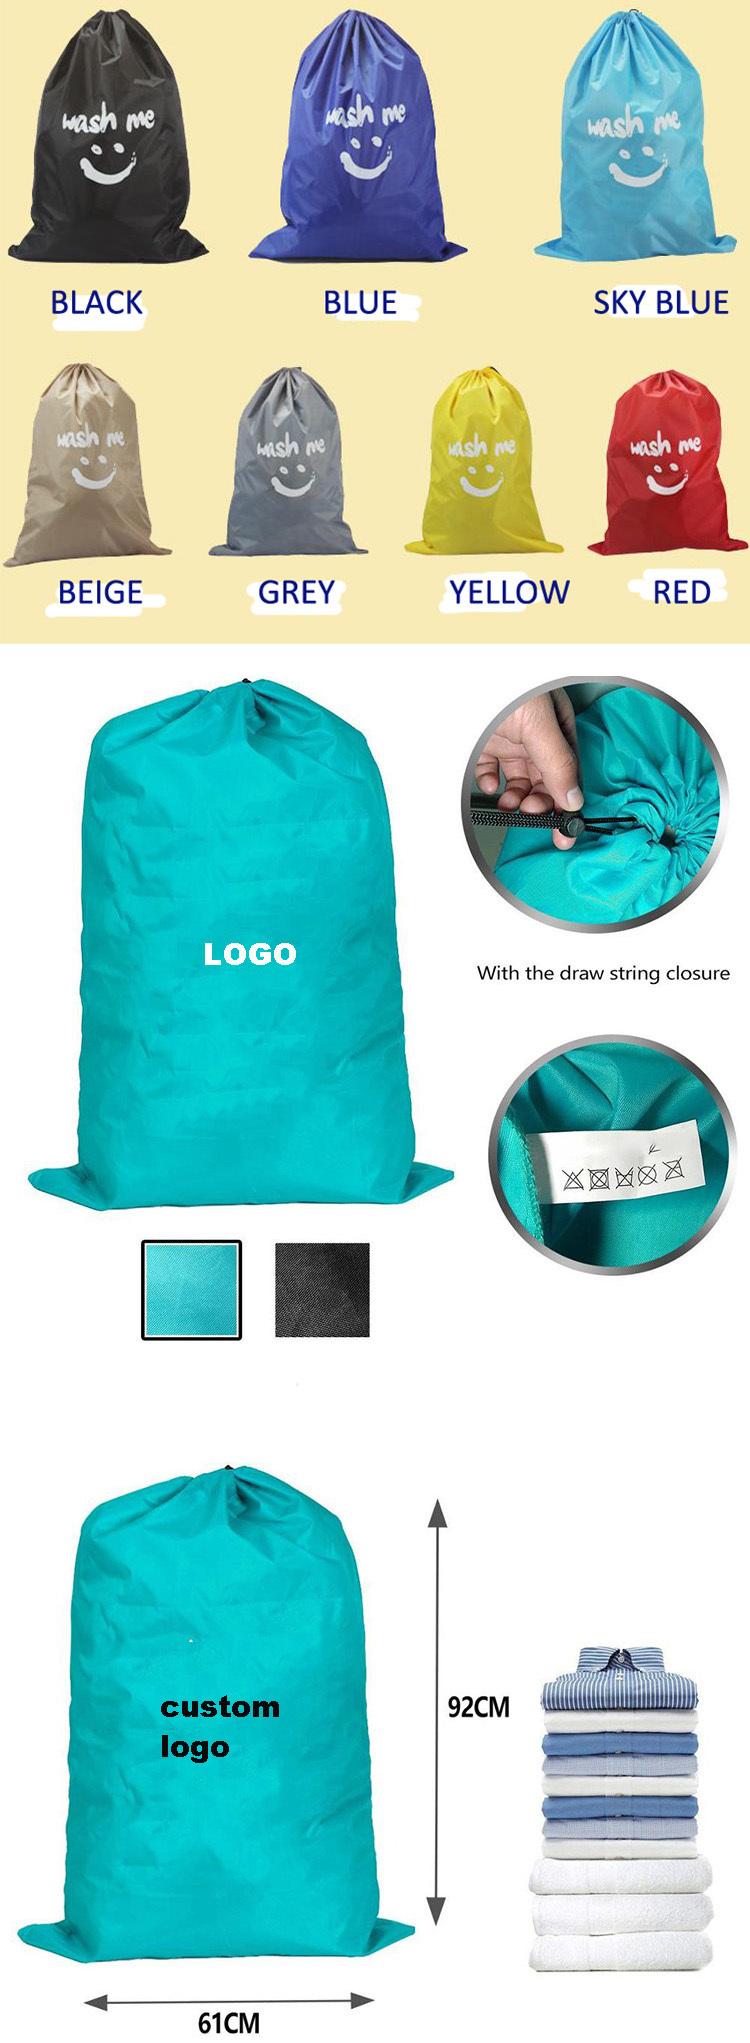 wholesale Customized Cheap nylon drawstring laundry bags big hospital Eco-friendly laundry bag with logo